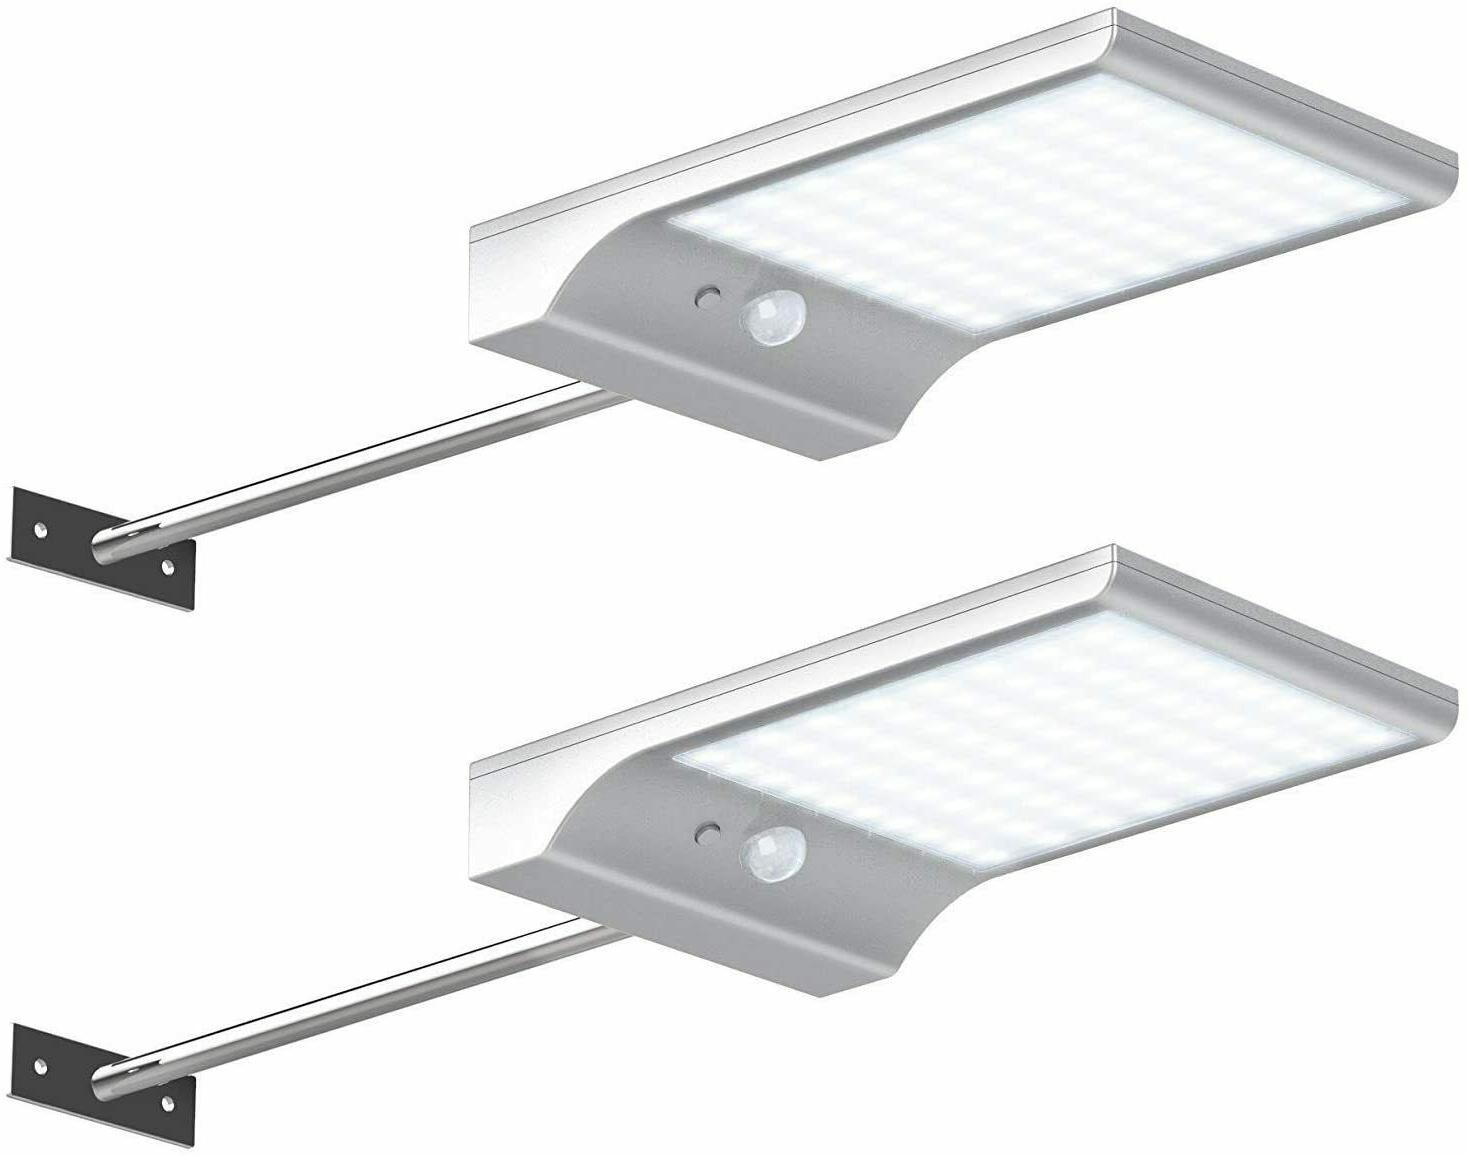 InnoGear Solar Wall Sconces Lighting, Pack of